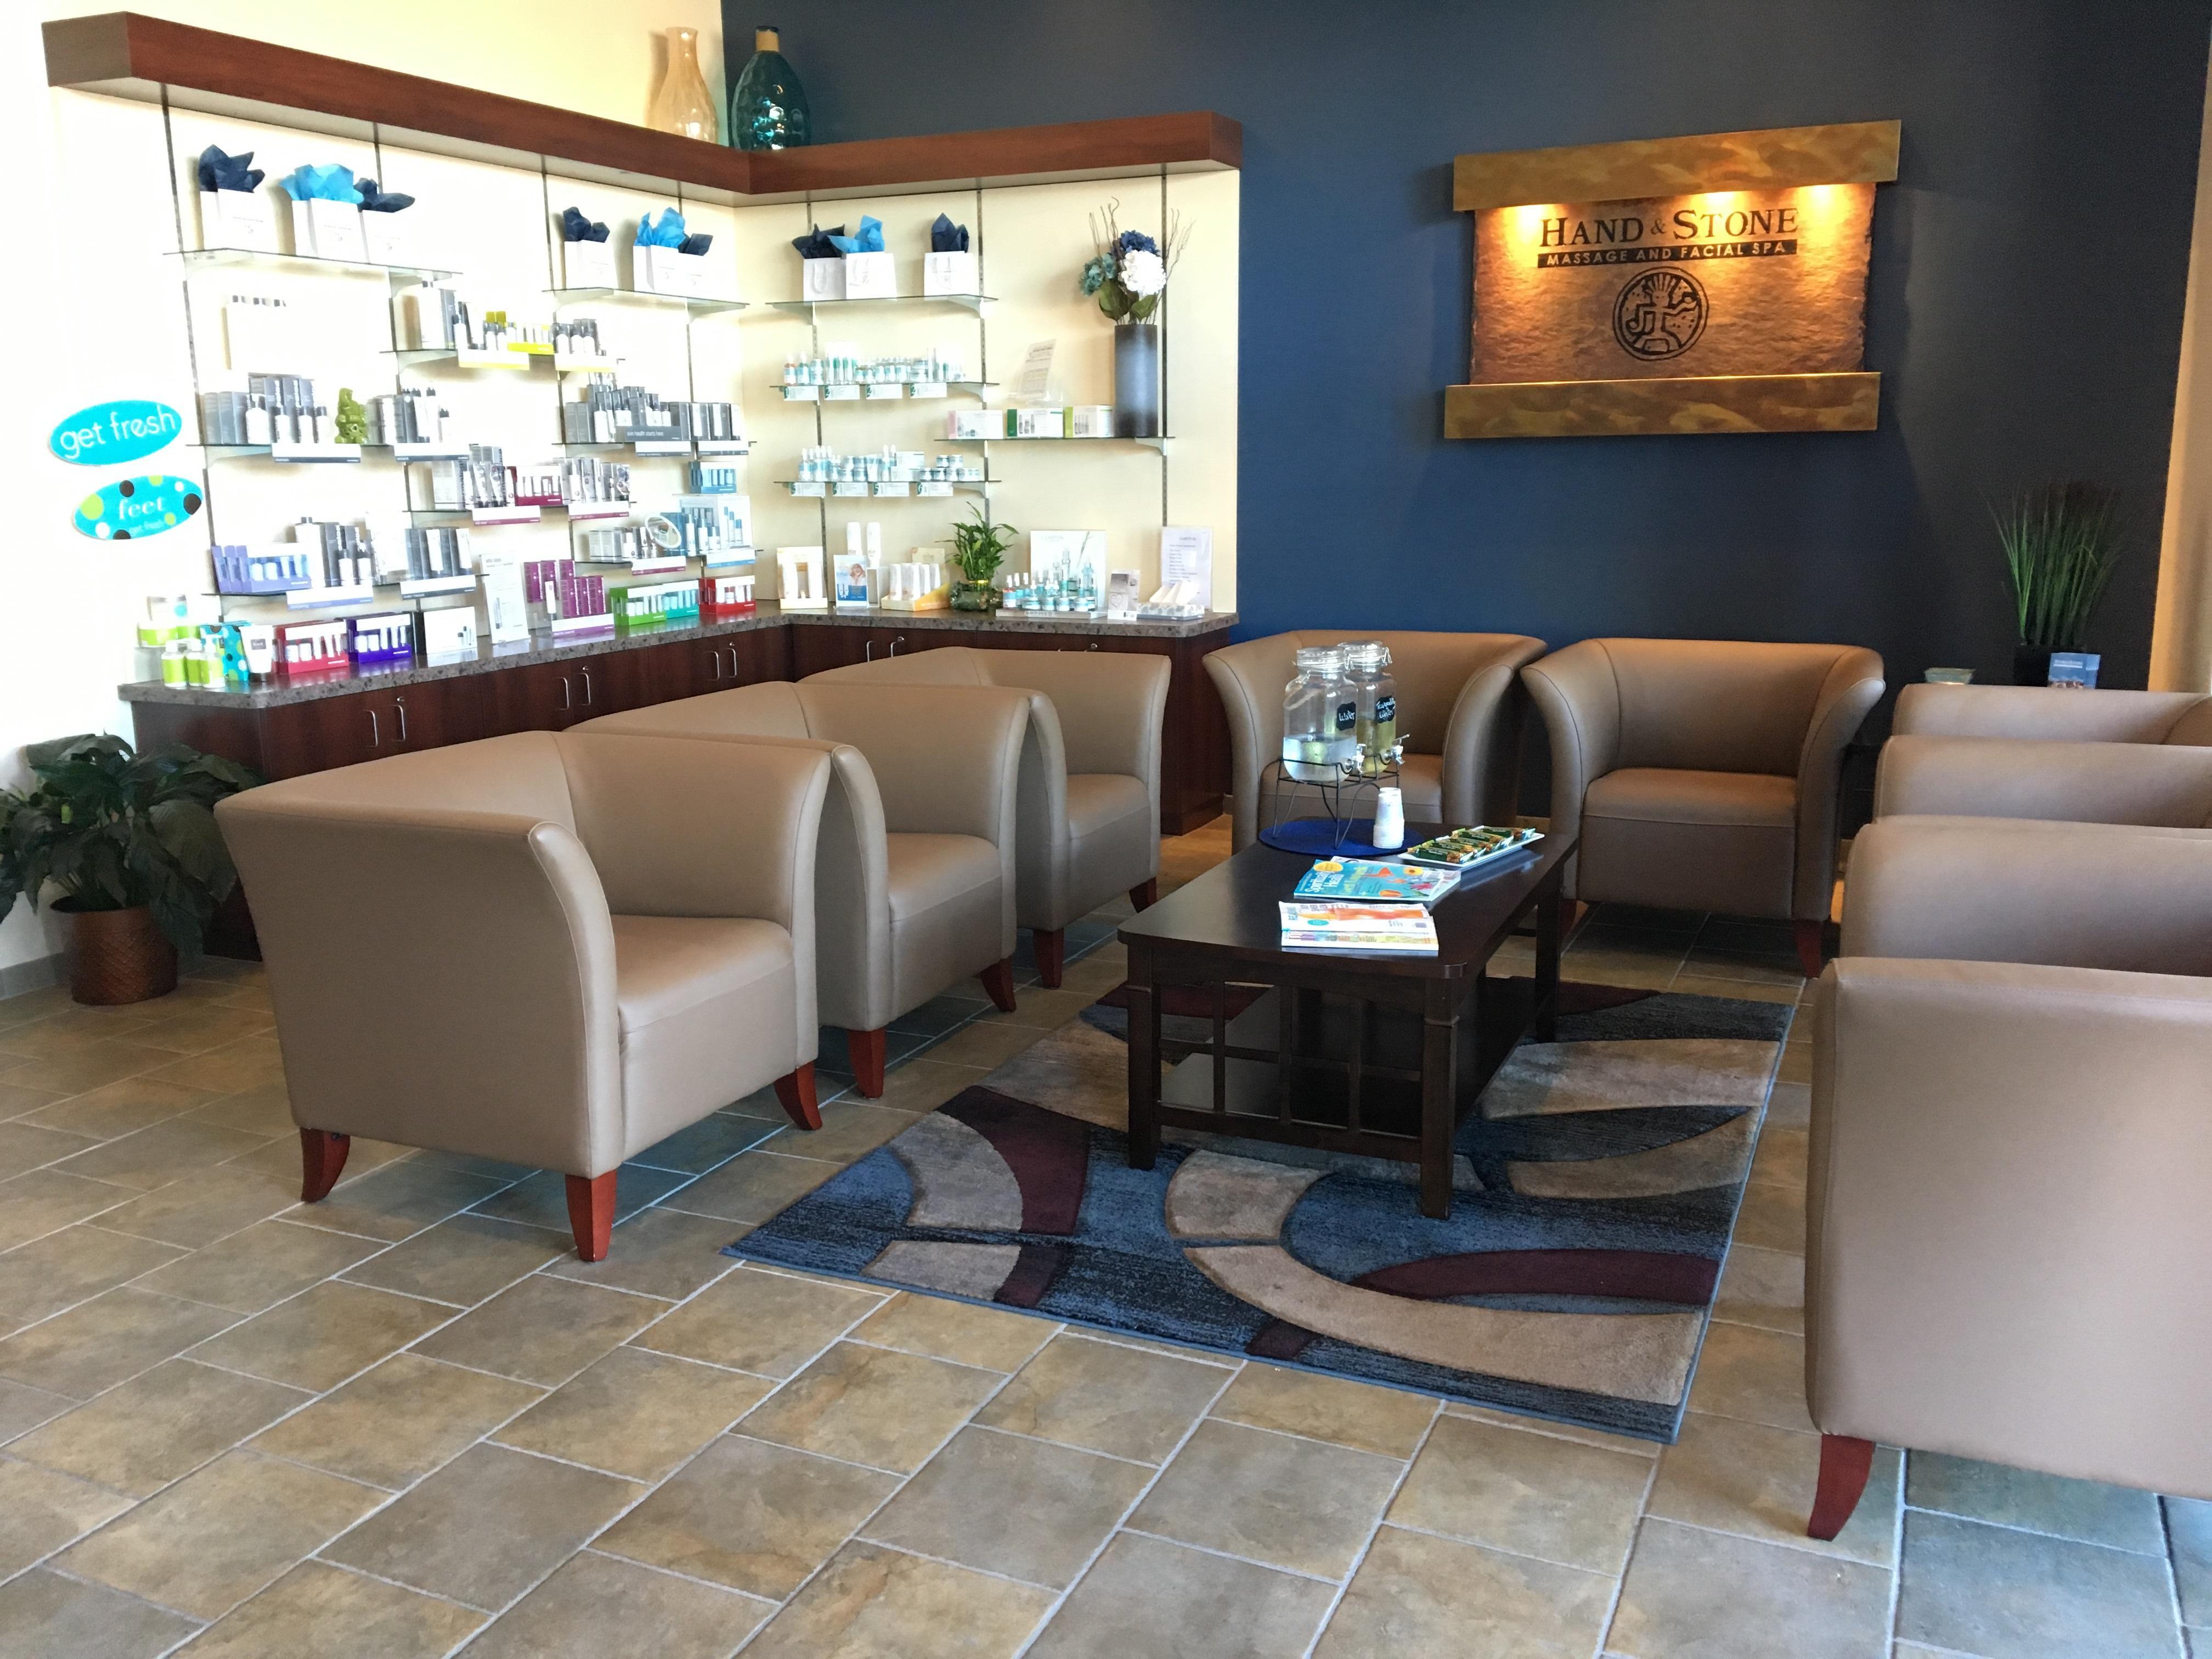 Hand stone massage and facial spa coupons peoria az near for Local spas near me